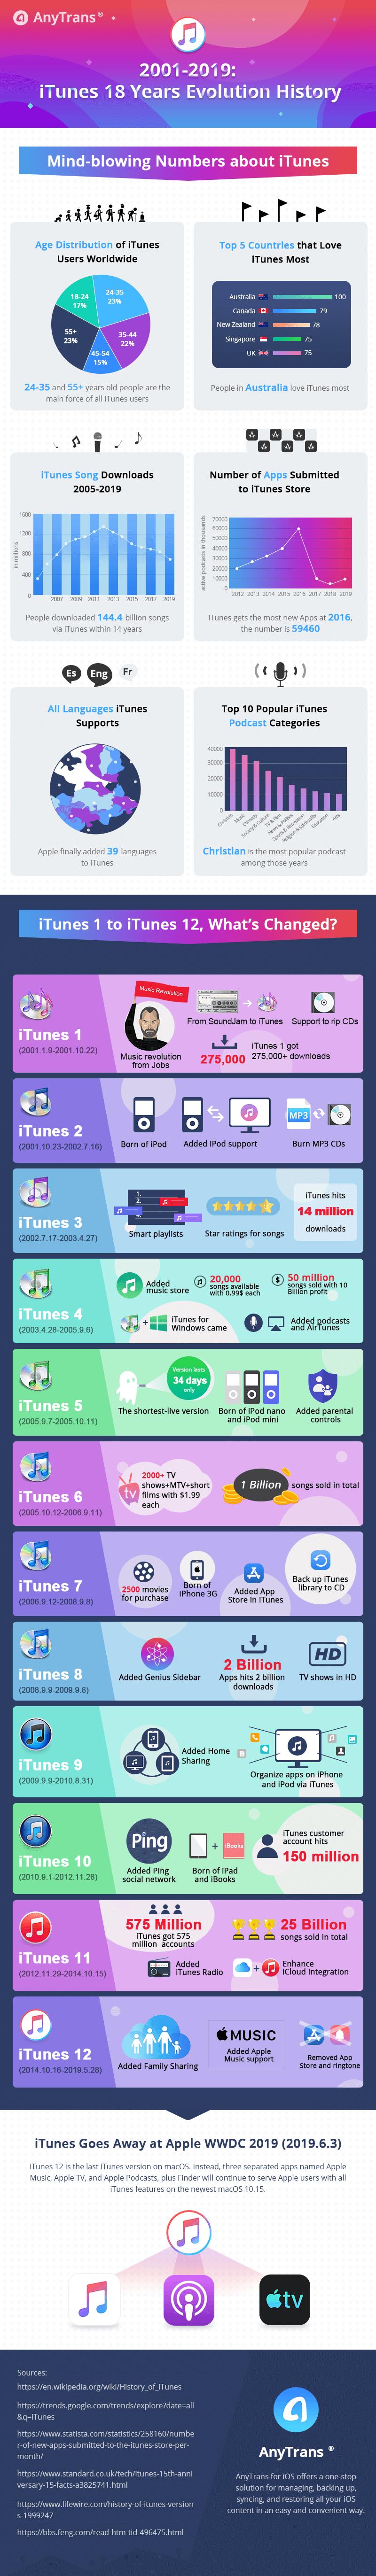 2001-2019: iTunes 18 Years Evolution History